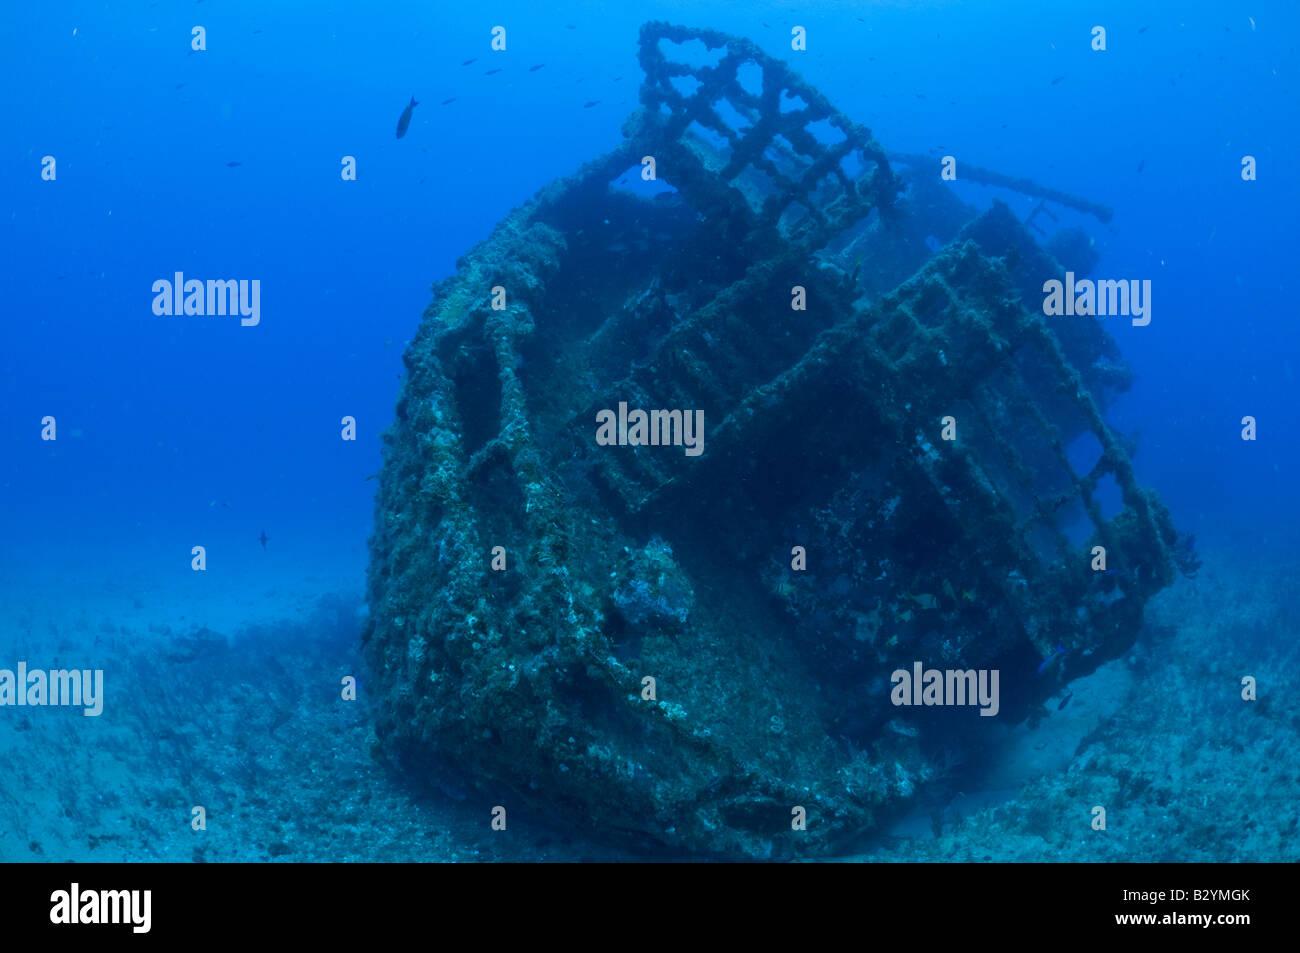 Shipwreck in Palm Beach, FL - Stock Image